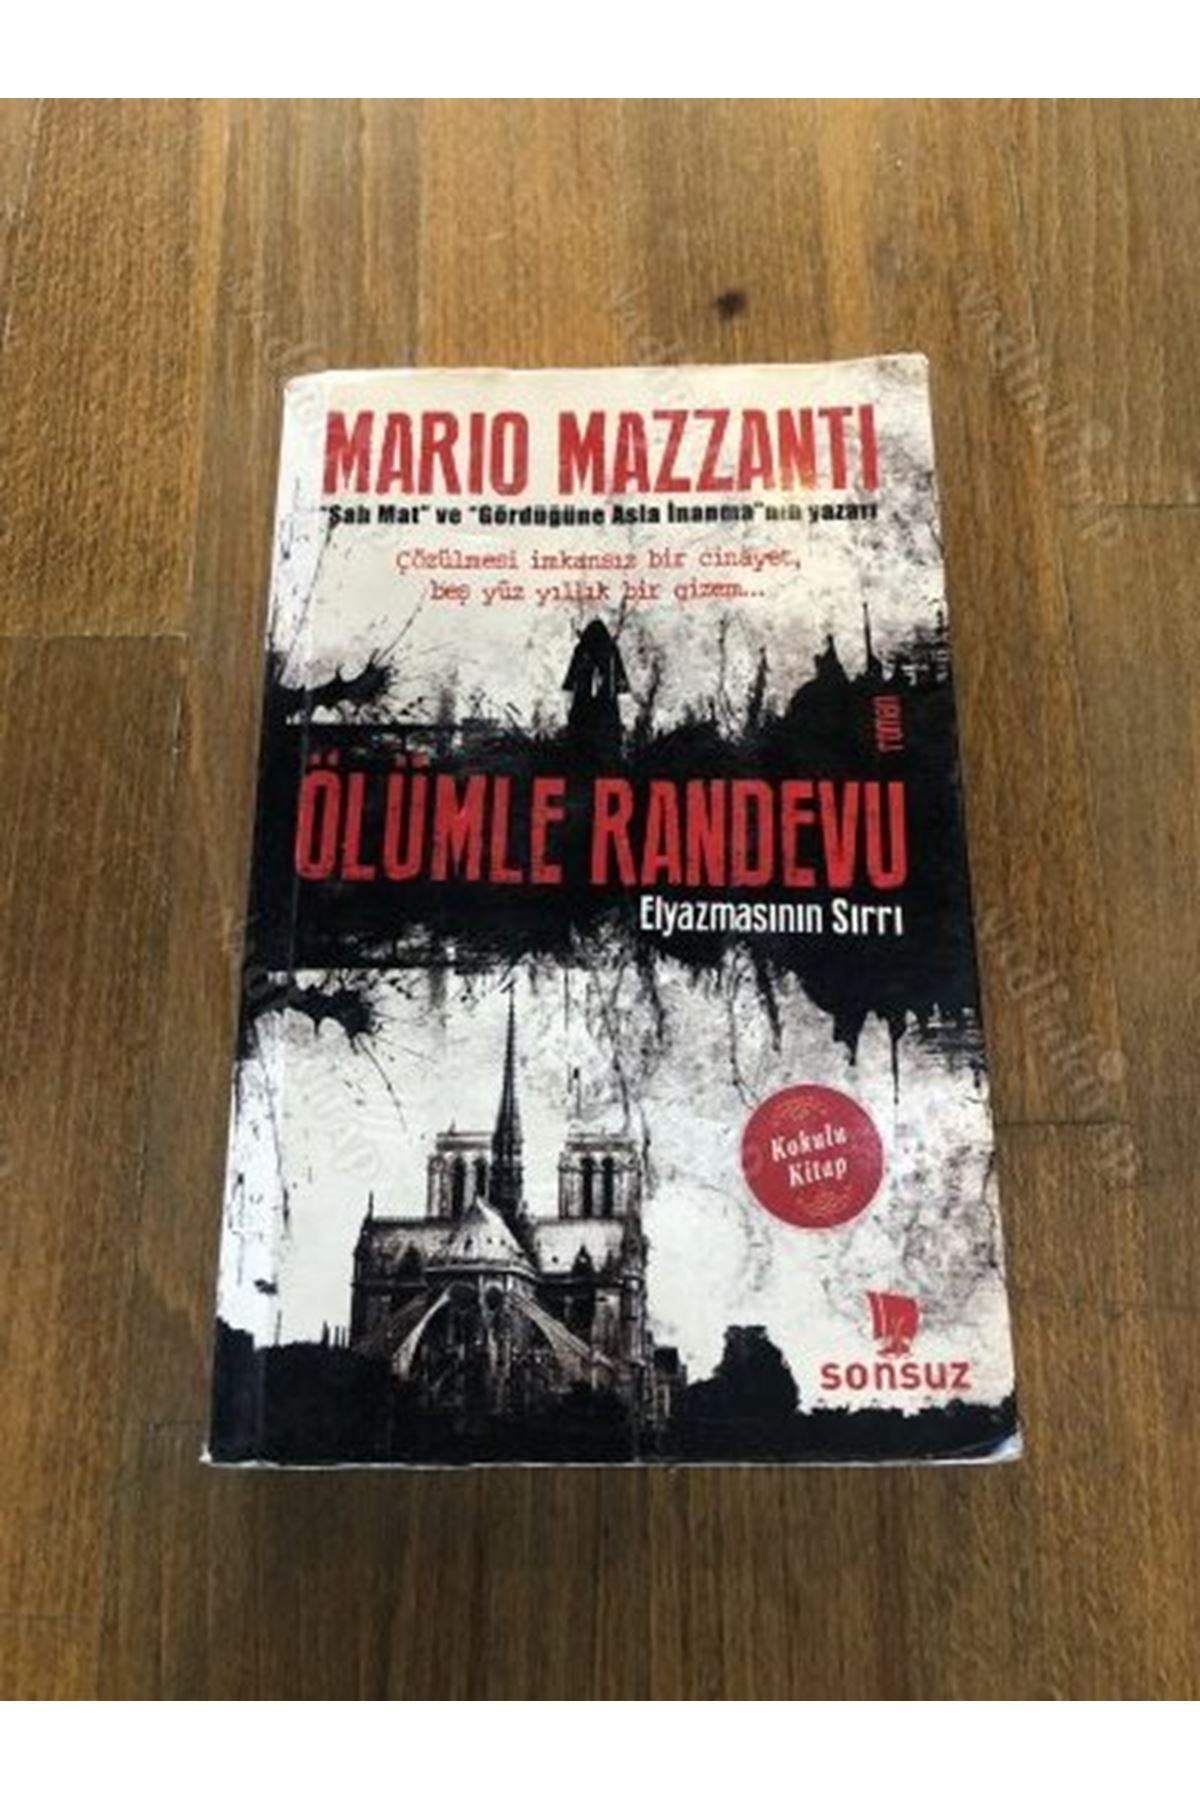 MARIO MAZZANTI - ÖLÜMLE RANDEVU